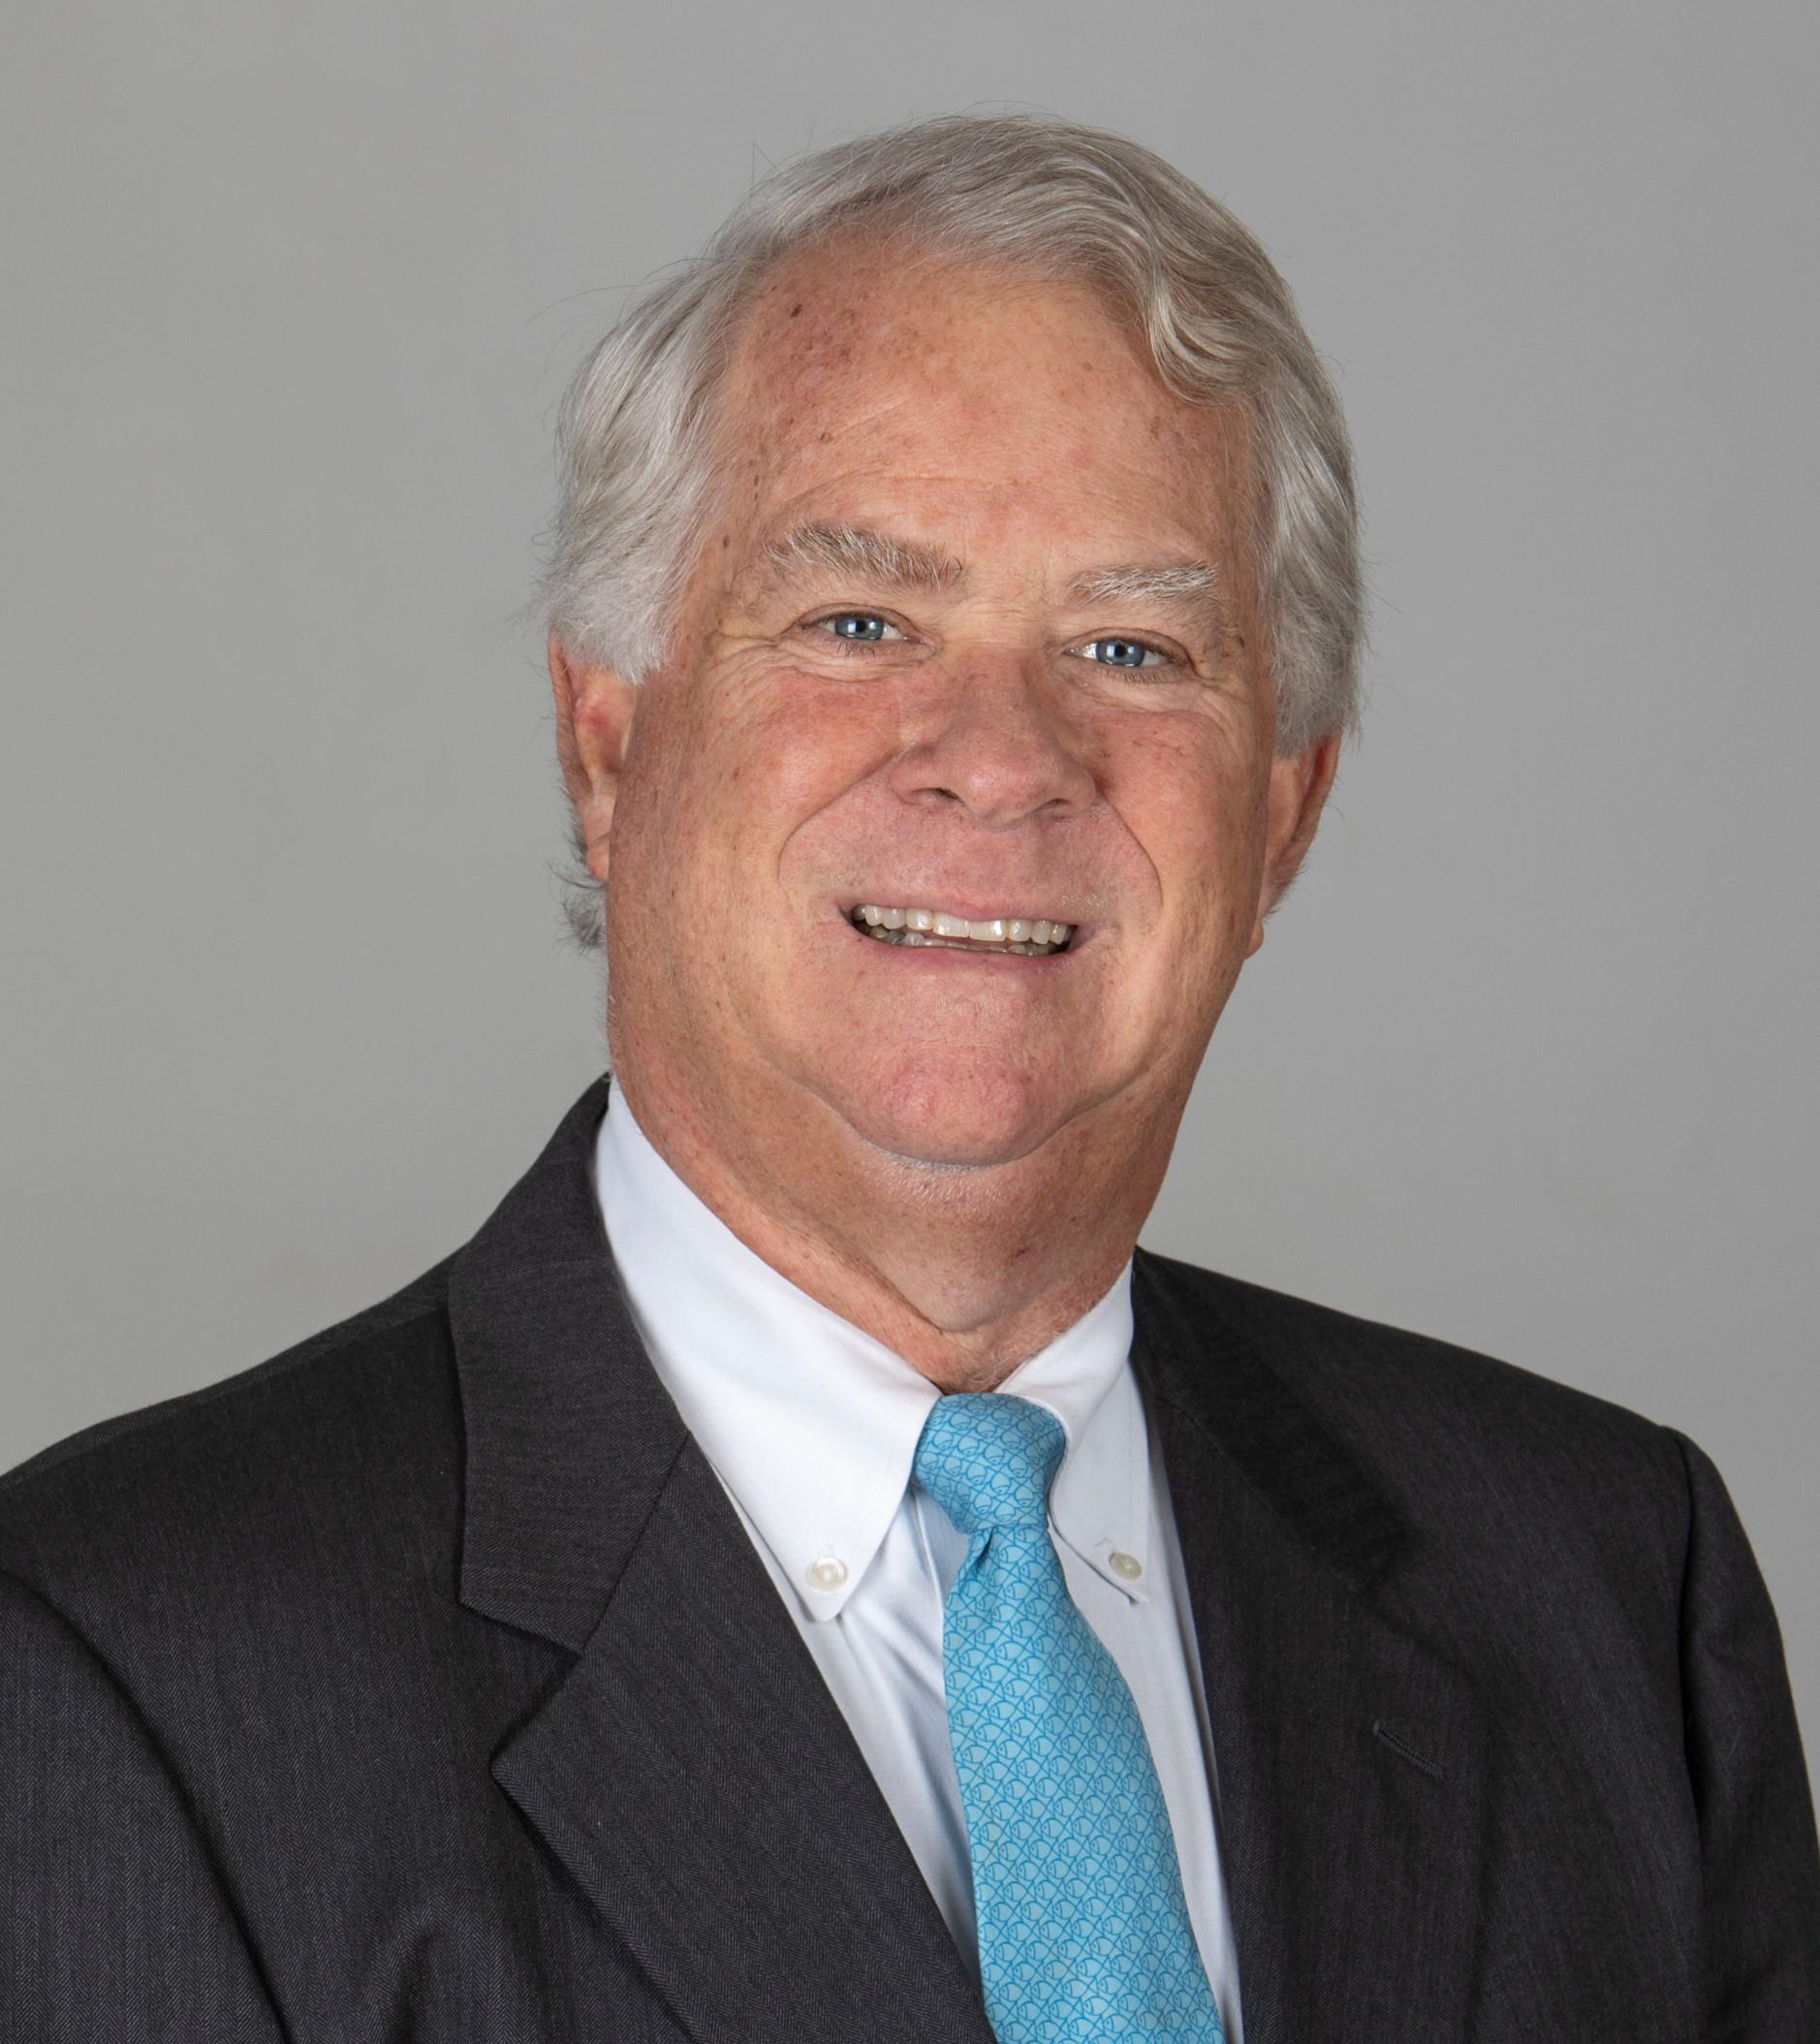 Greenville Midwifery Care >> S.C. Senate Confirms Dr. Rick Toomey as Head of DHEC | SCDHEC